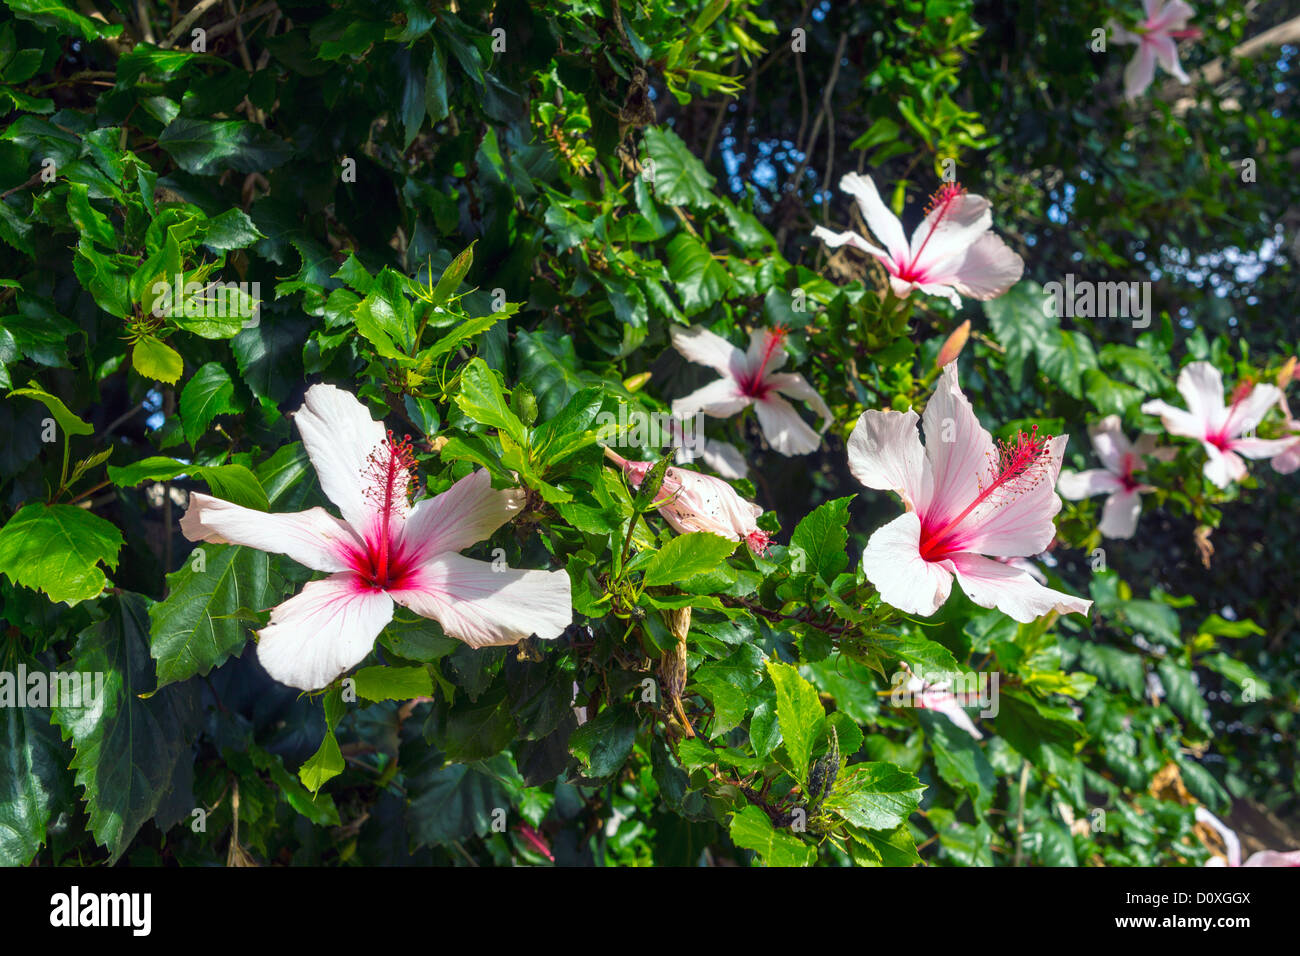 White Hibiscus Flower Stock Photos & White Hibiscus Flower Stock ...